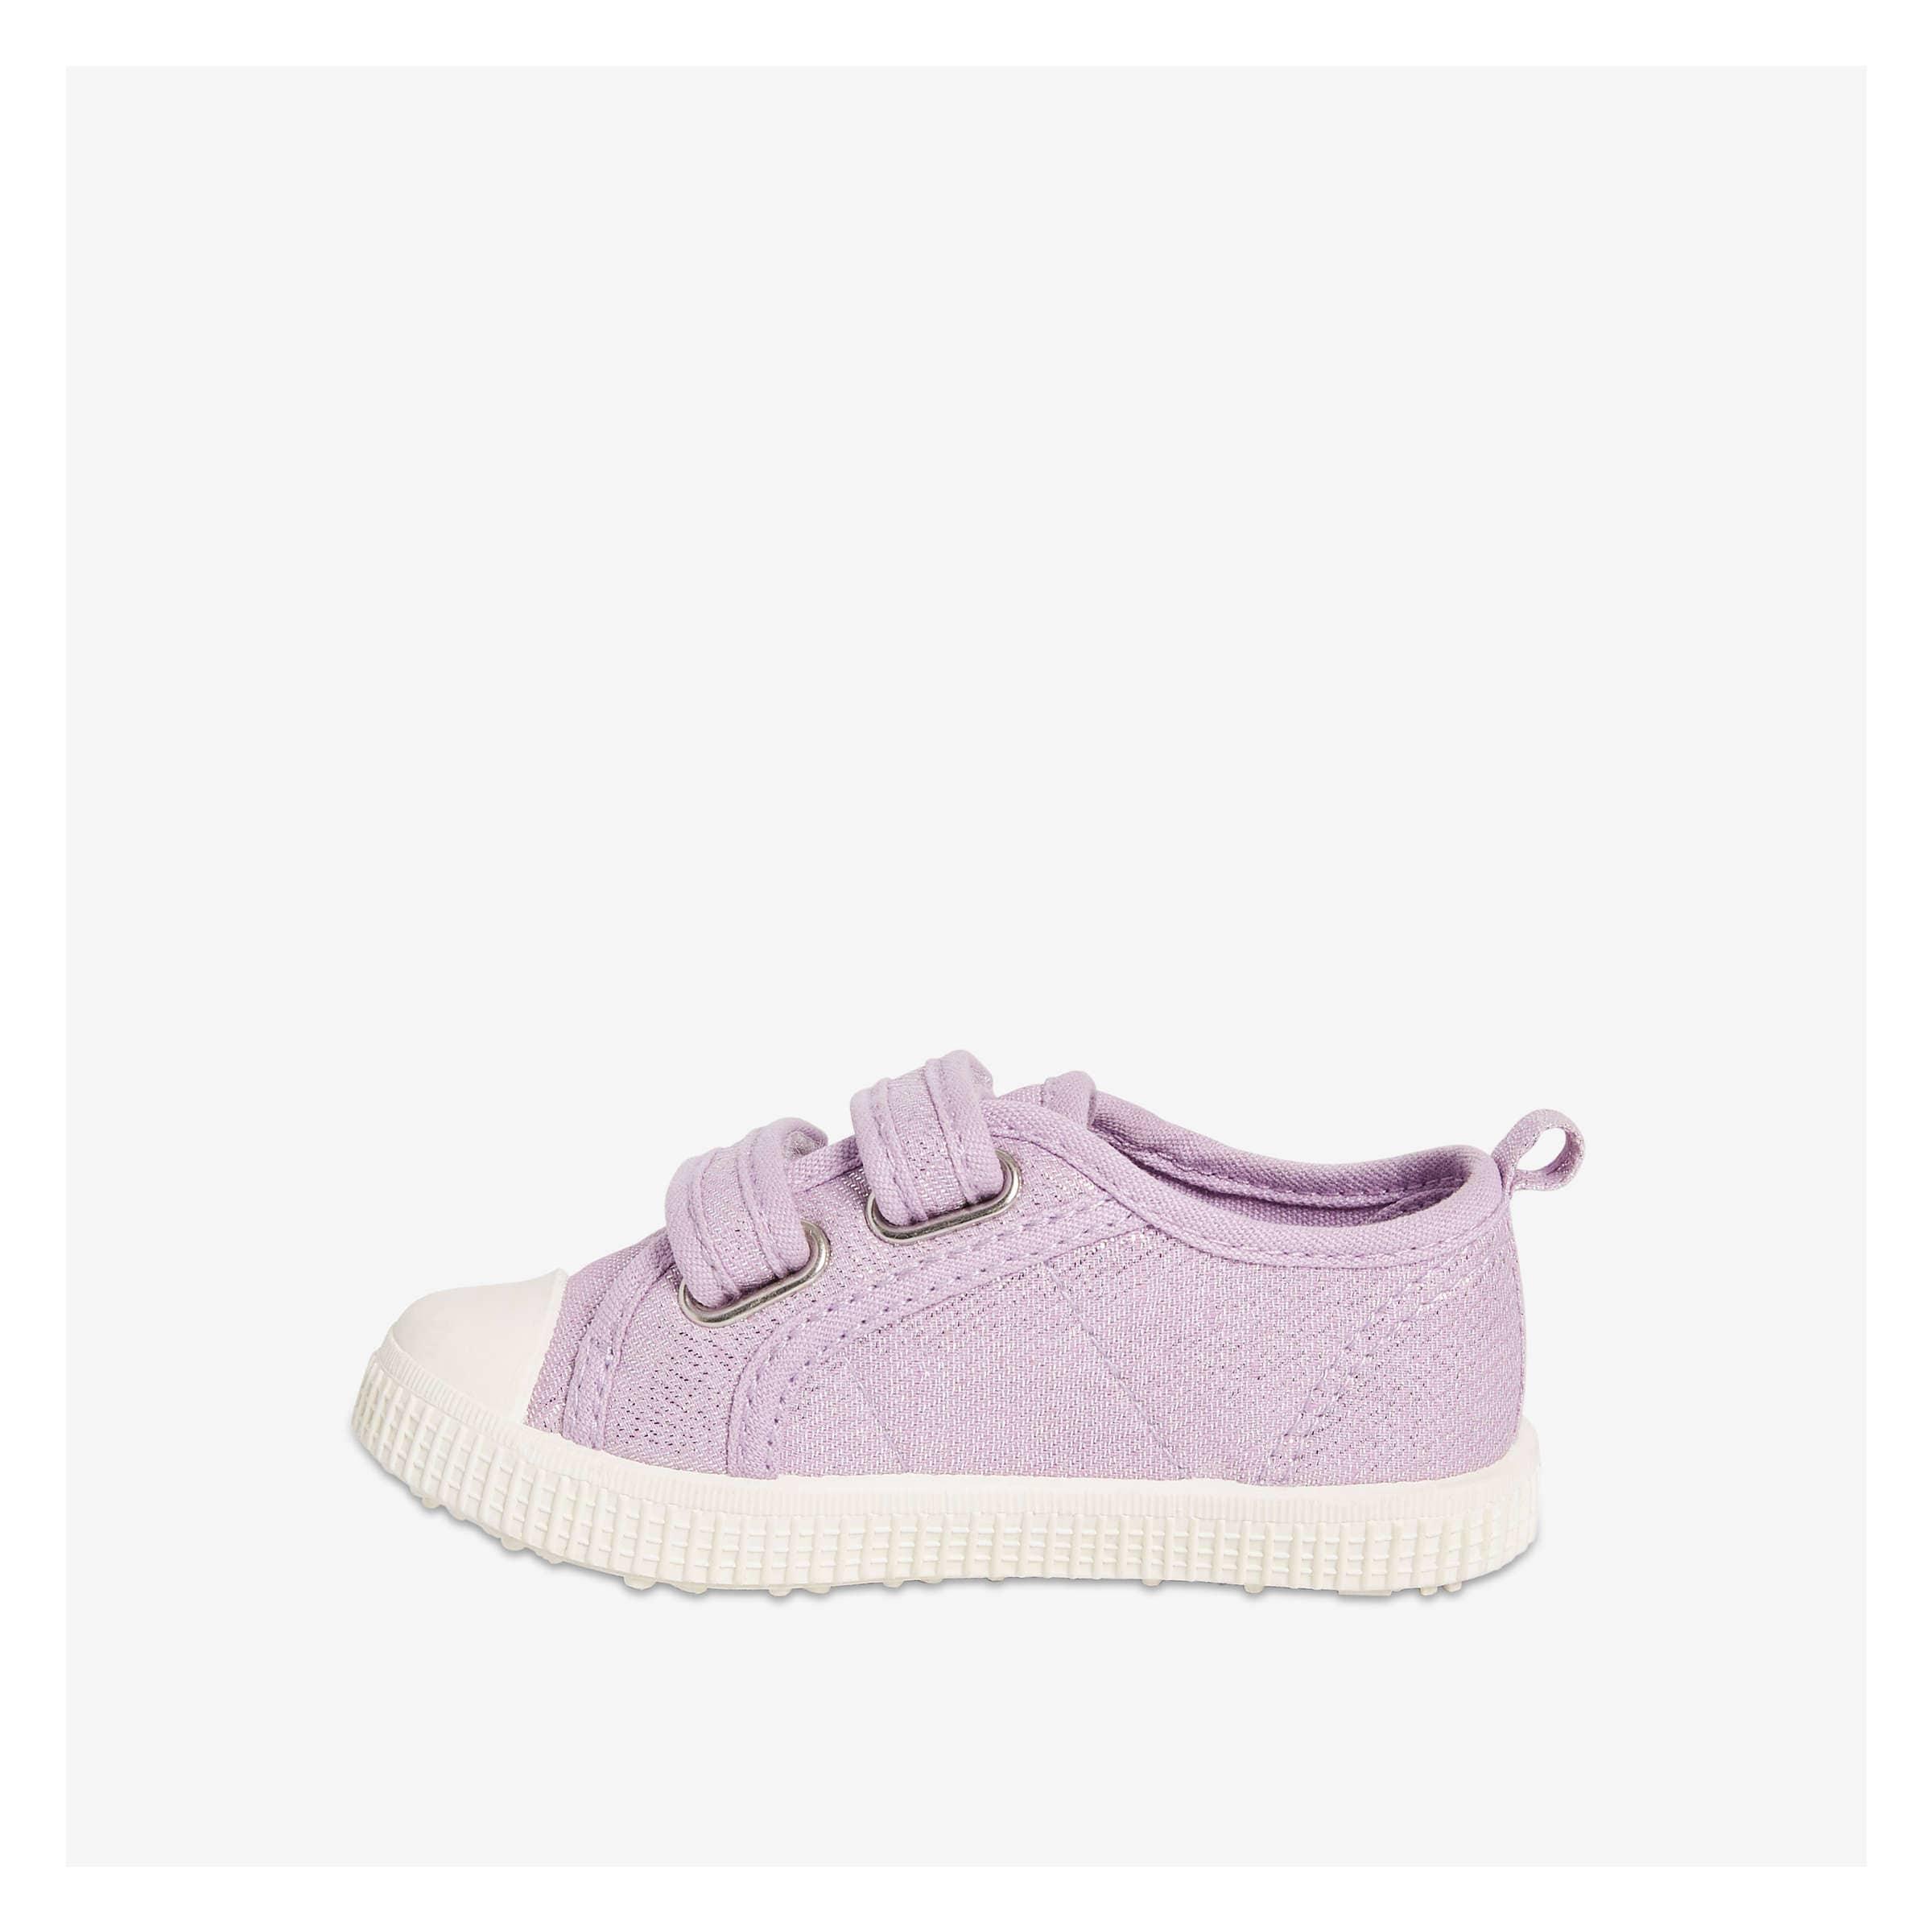 91e4923c3a6 Baby Girls  Canvas Walker in Light Pink from Joe Fresh